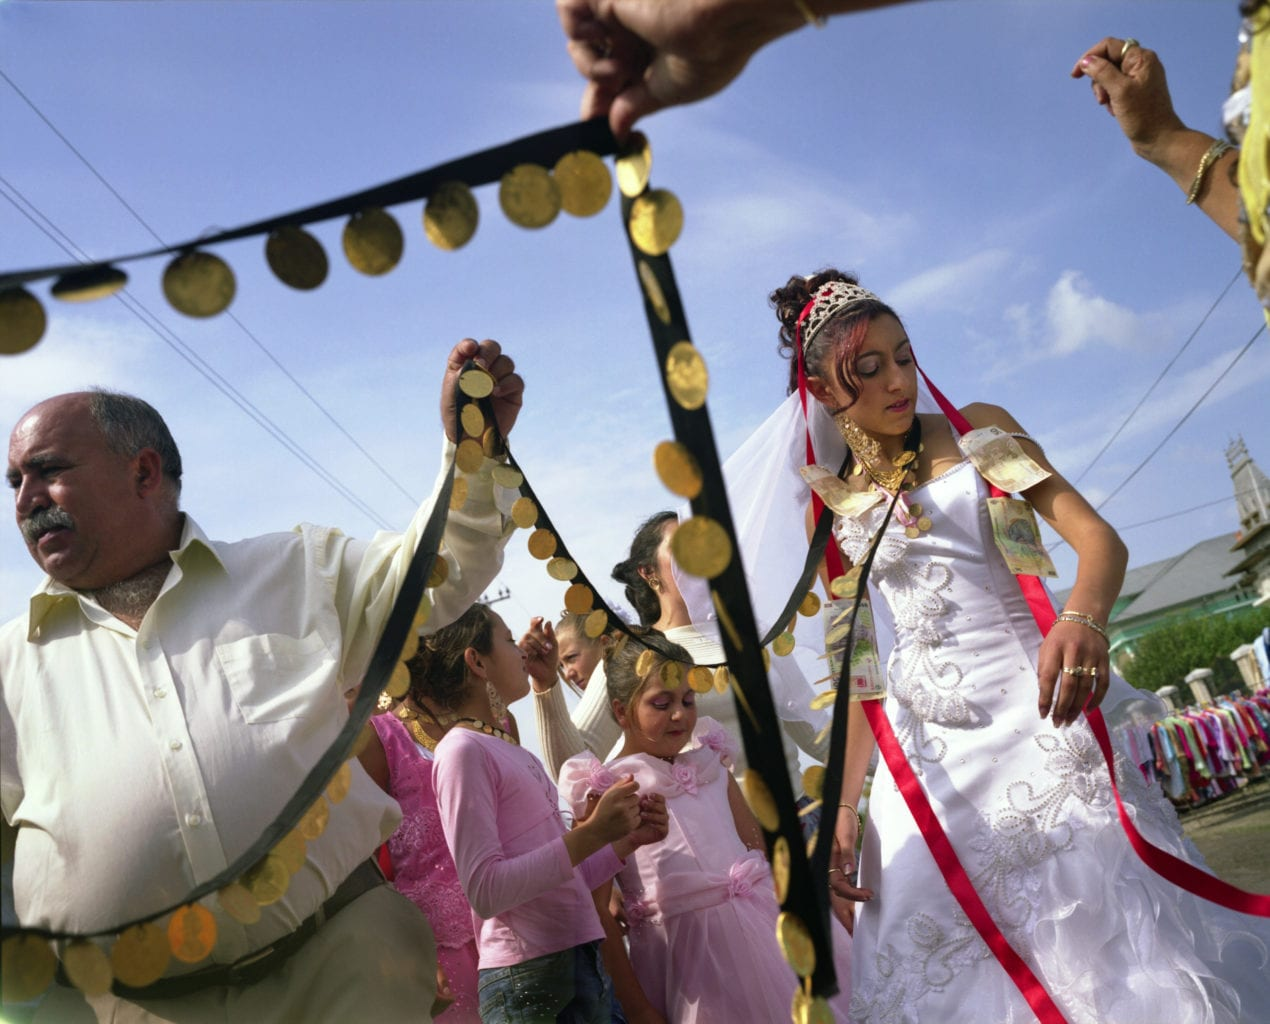 Garoafa's wedding day, Sintesti Roma camp, Romania, 2006.